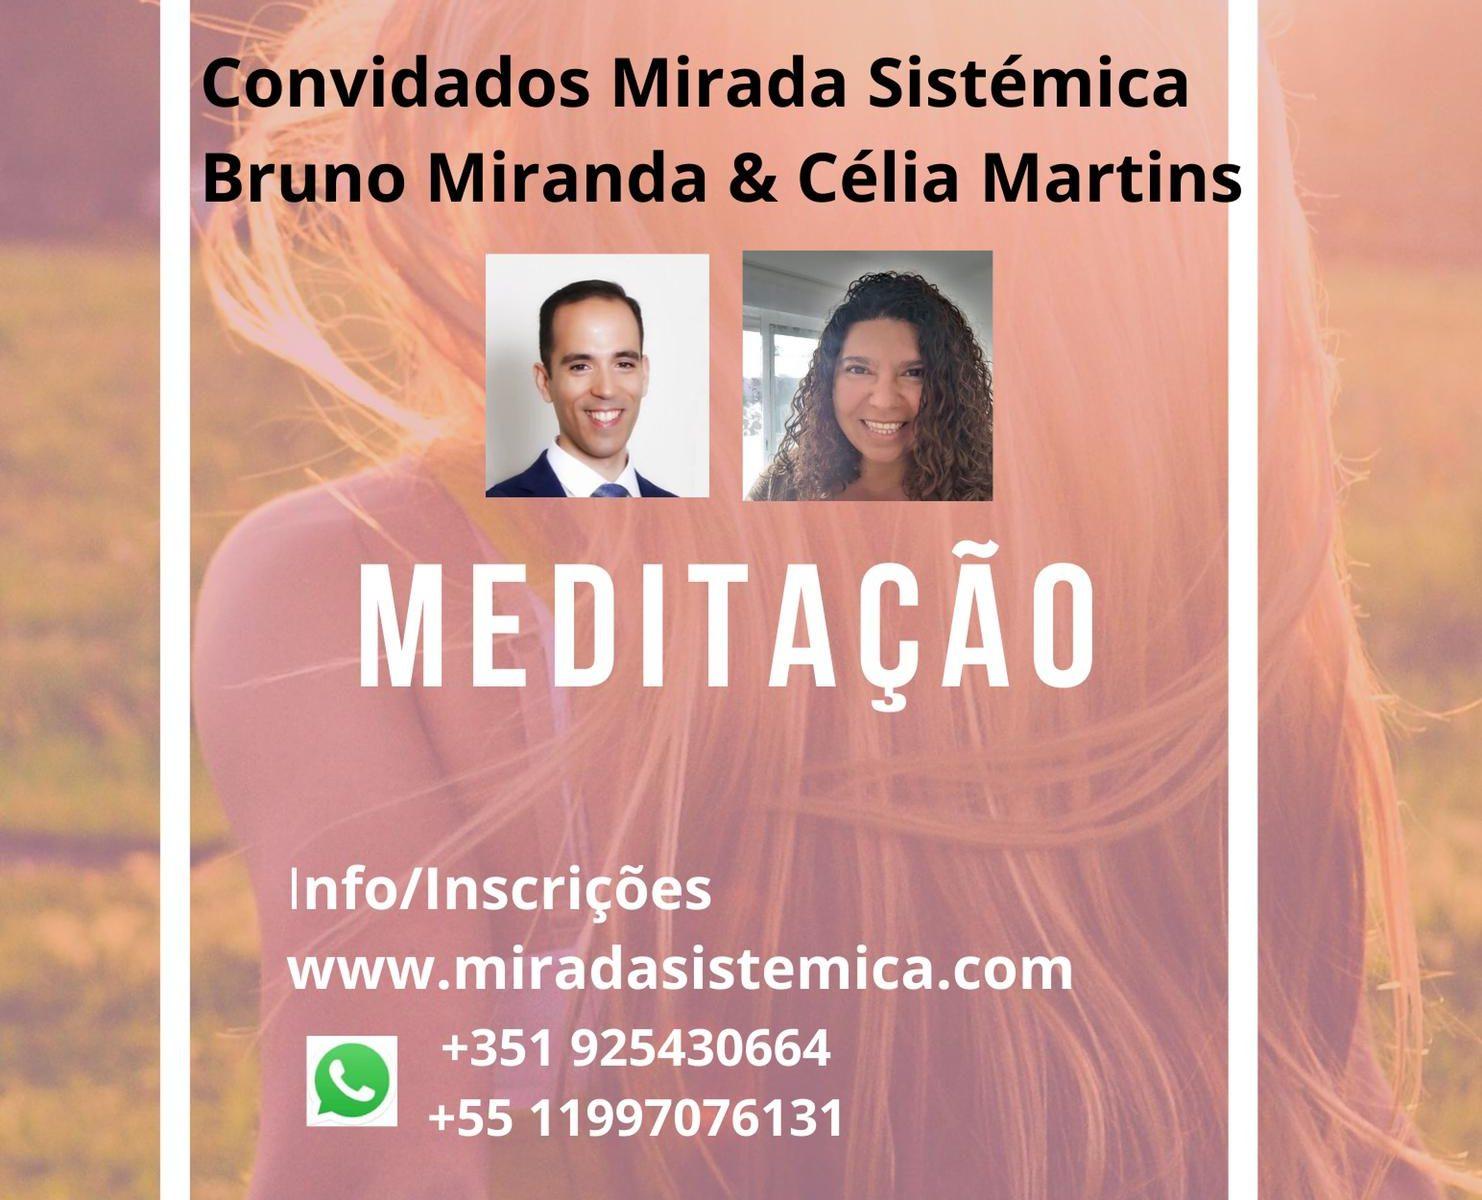 Webinar meditação 23-5- Mirada Sistémica